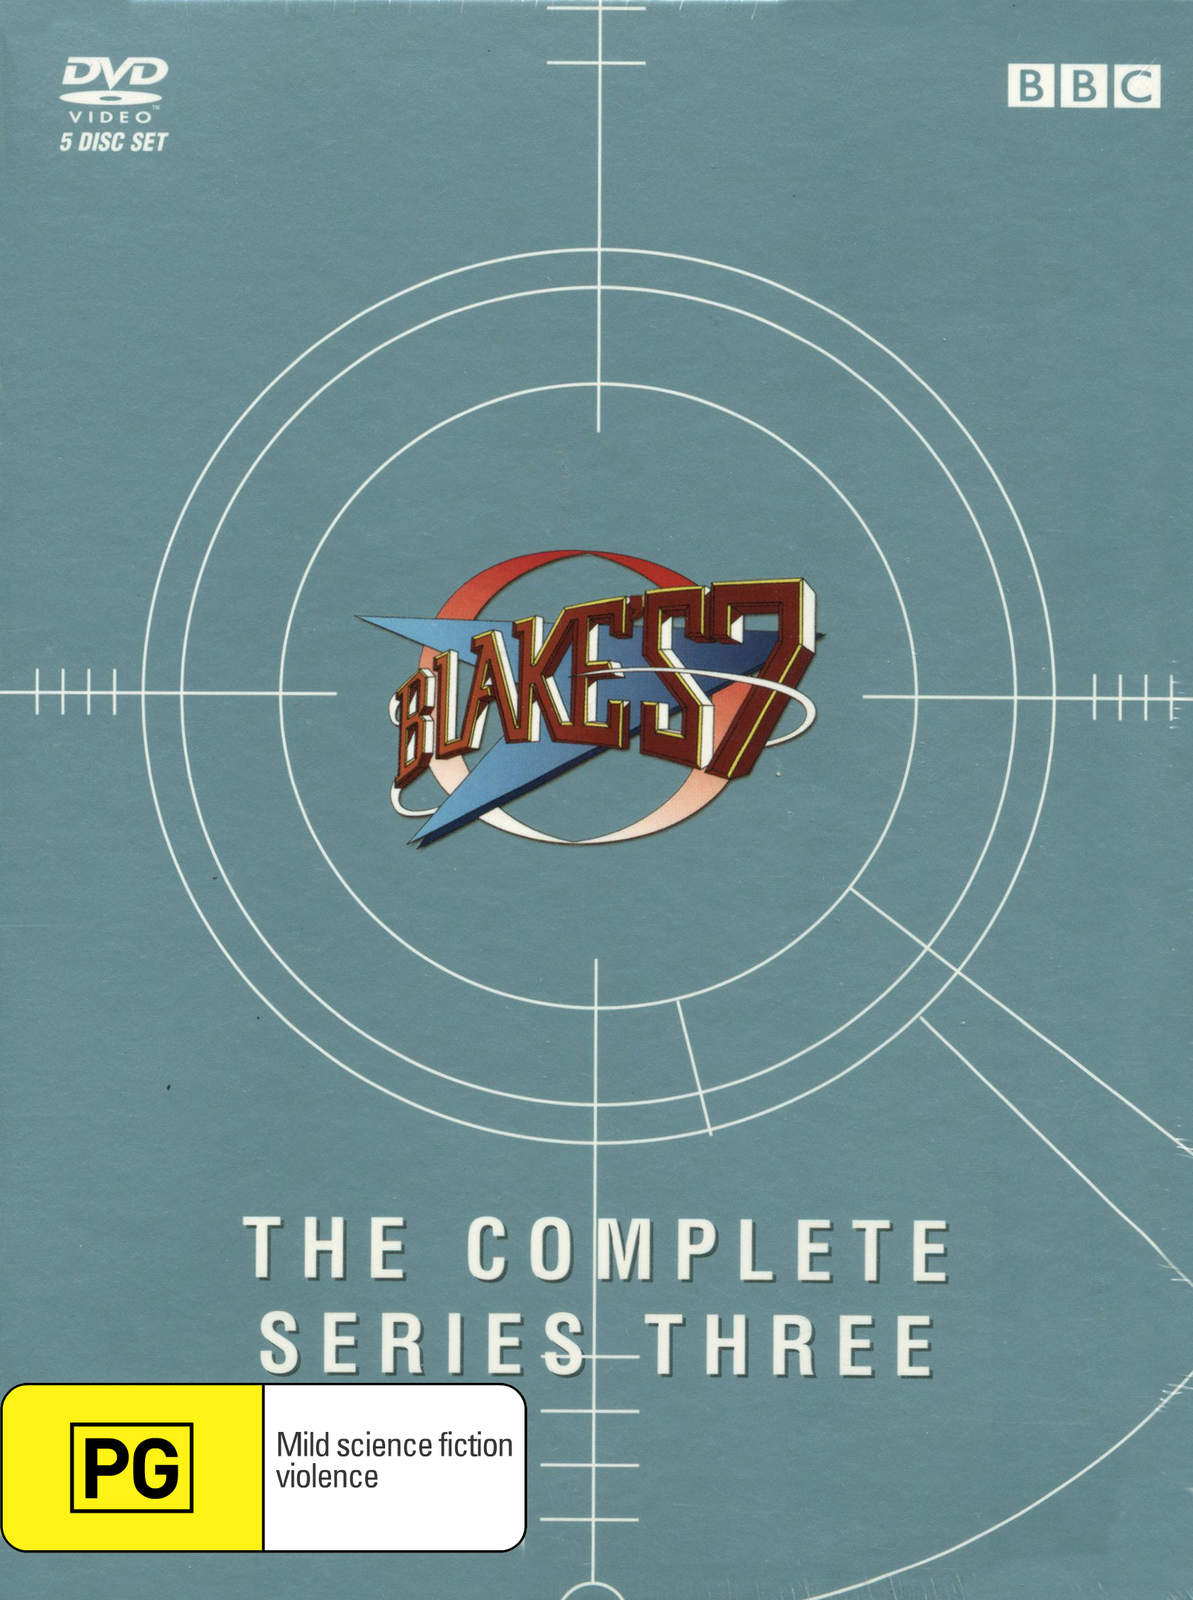 Blake's 7 - Complete Series 3 image